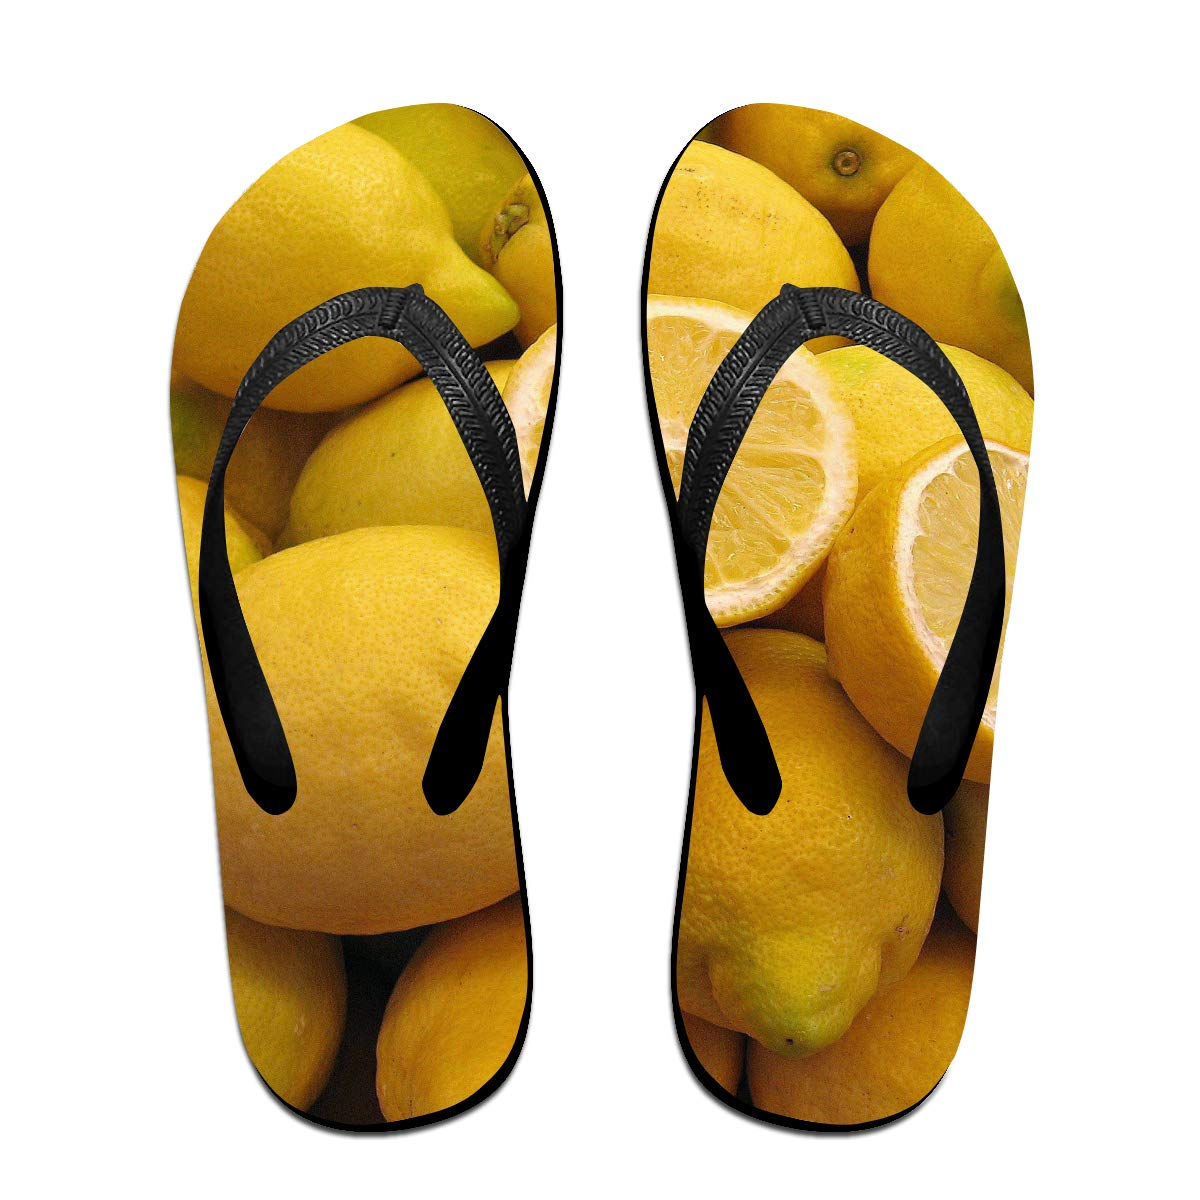 Lojaon Couple Slipper Lemon Close Up Photo Print Flip Flops Unisex Chic Sandals Rubber Non-Slip Beach Thong Slippers